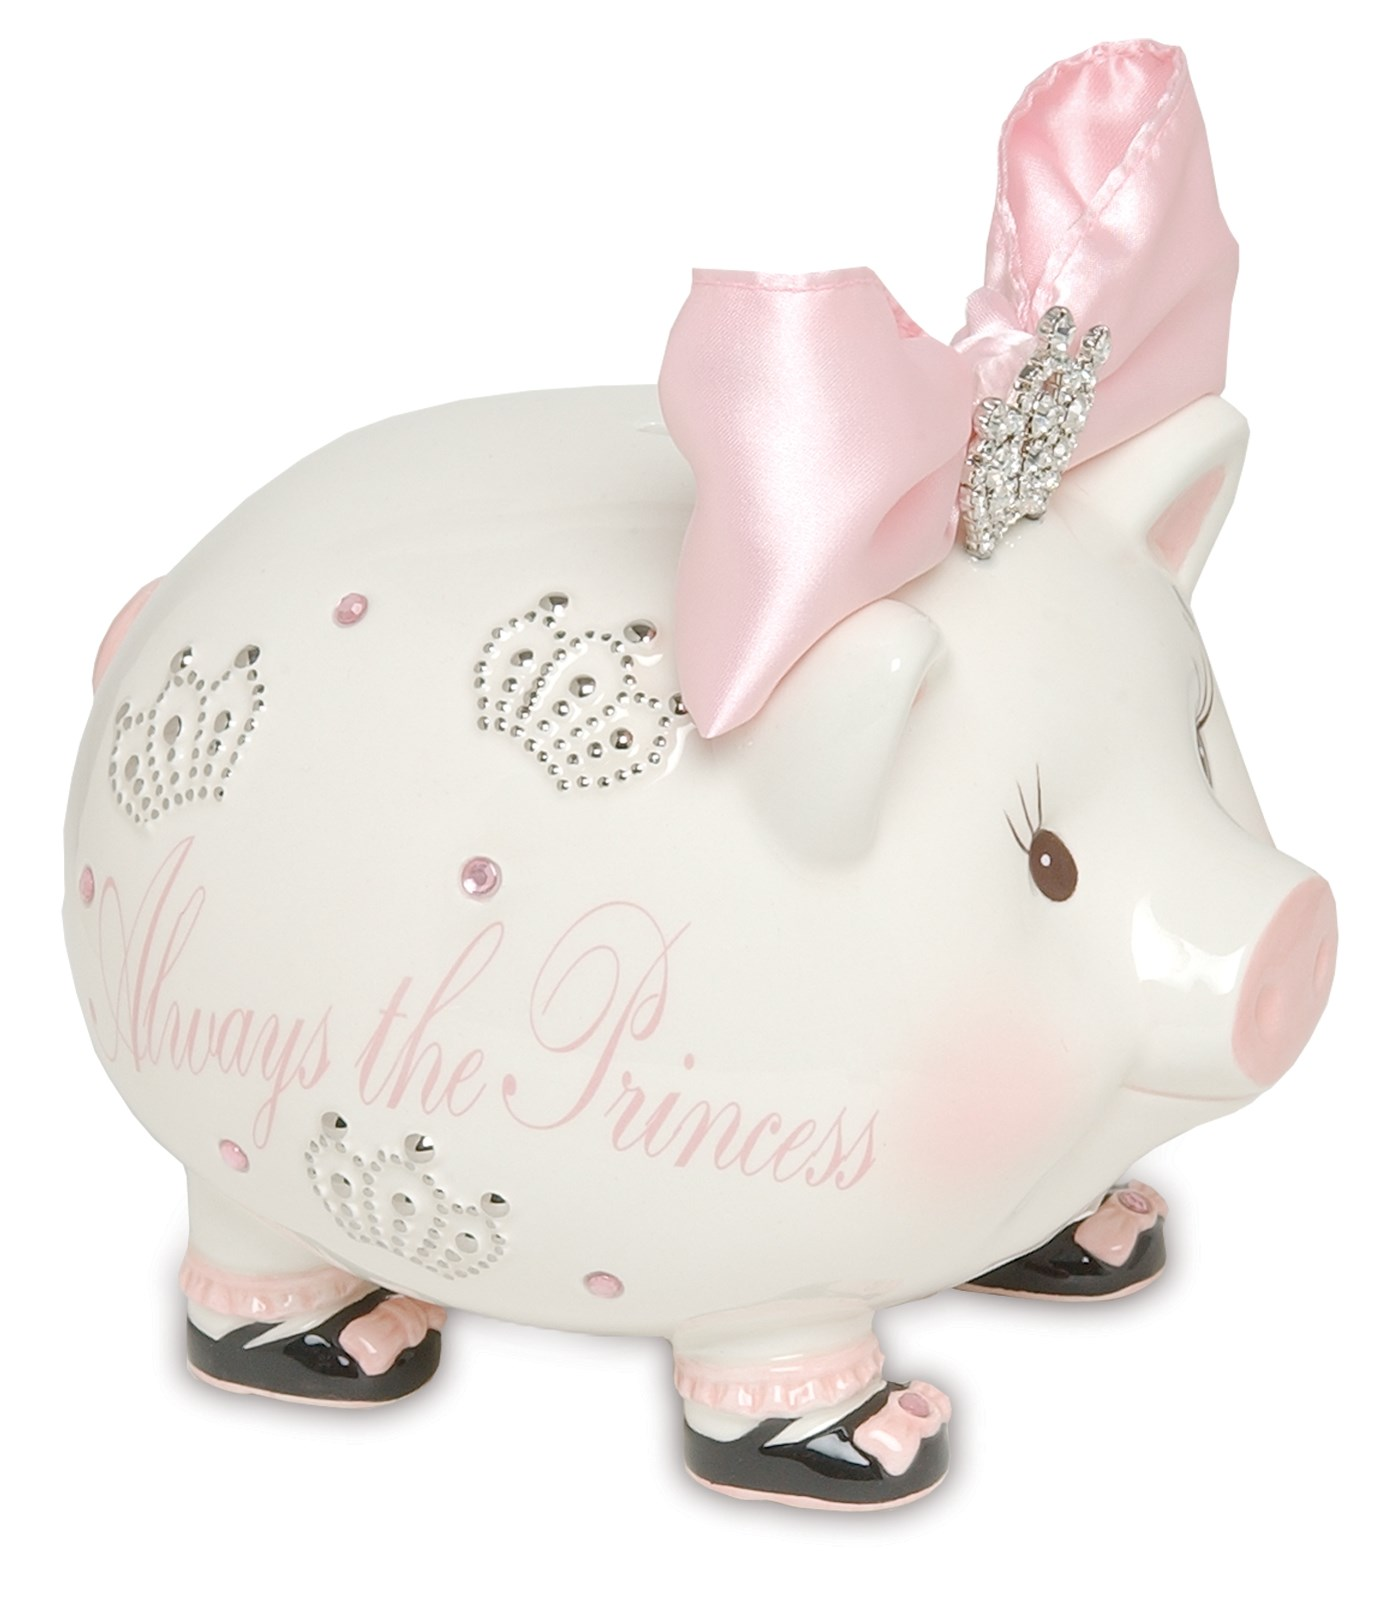 Image of Princess Jeweled Piggy Bank